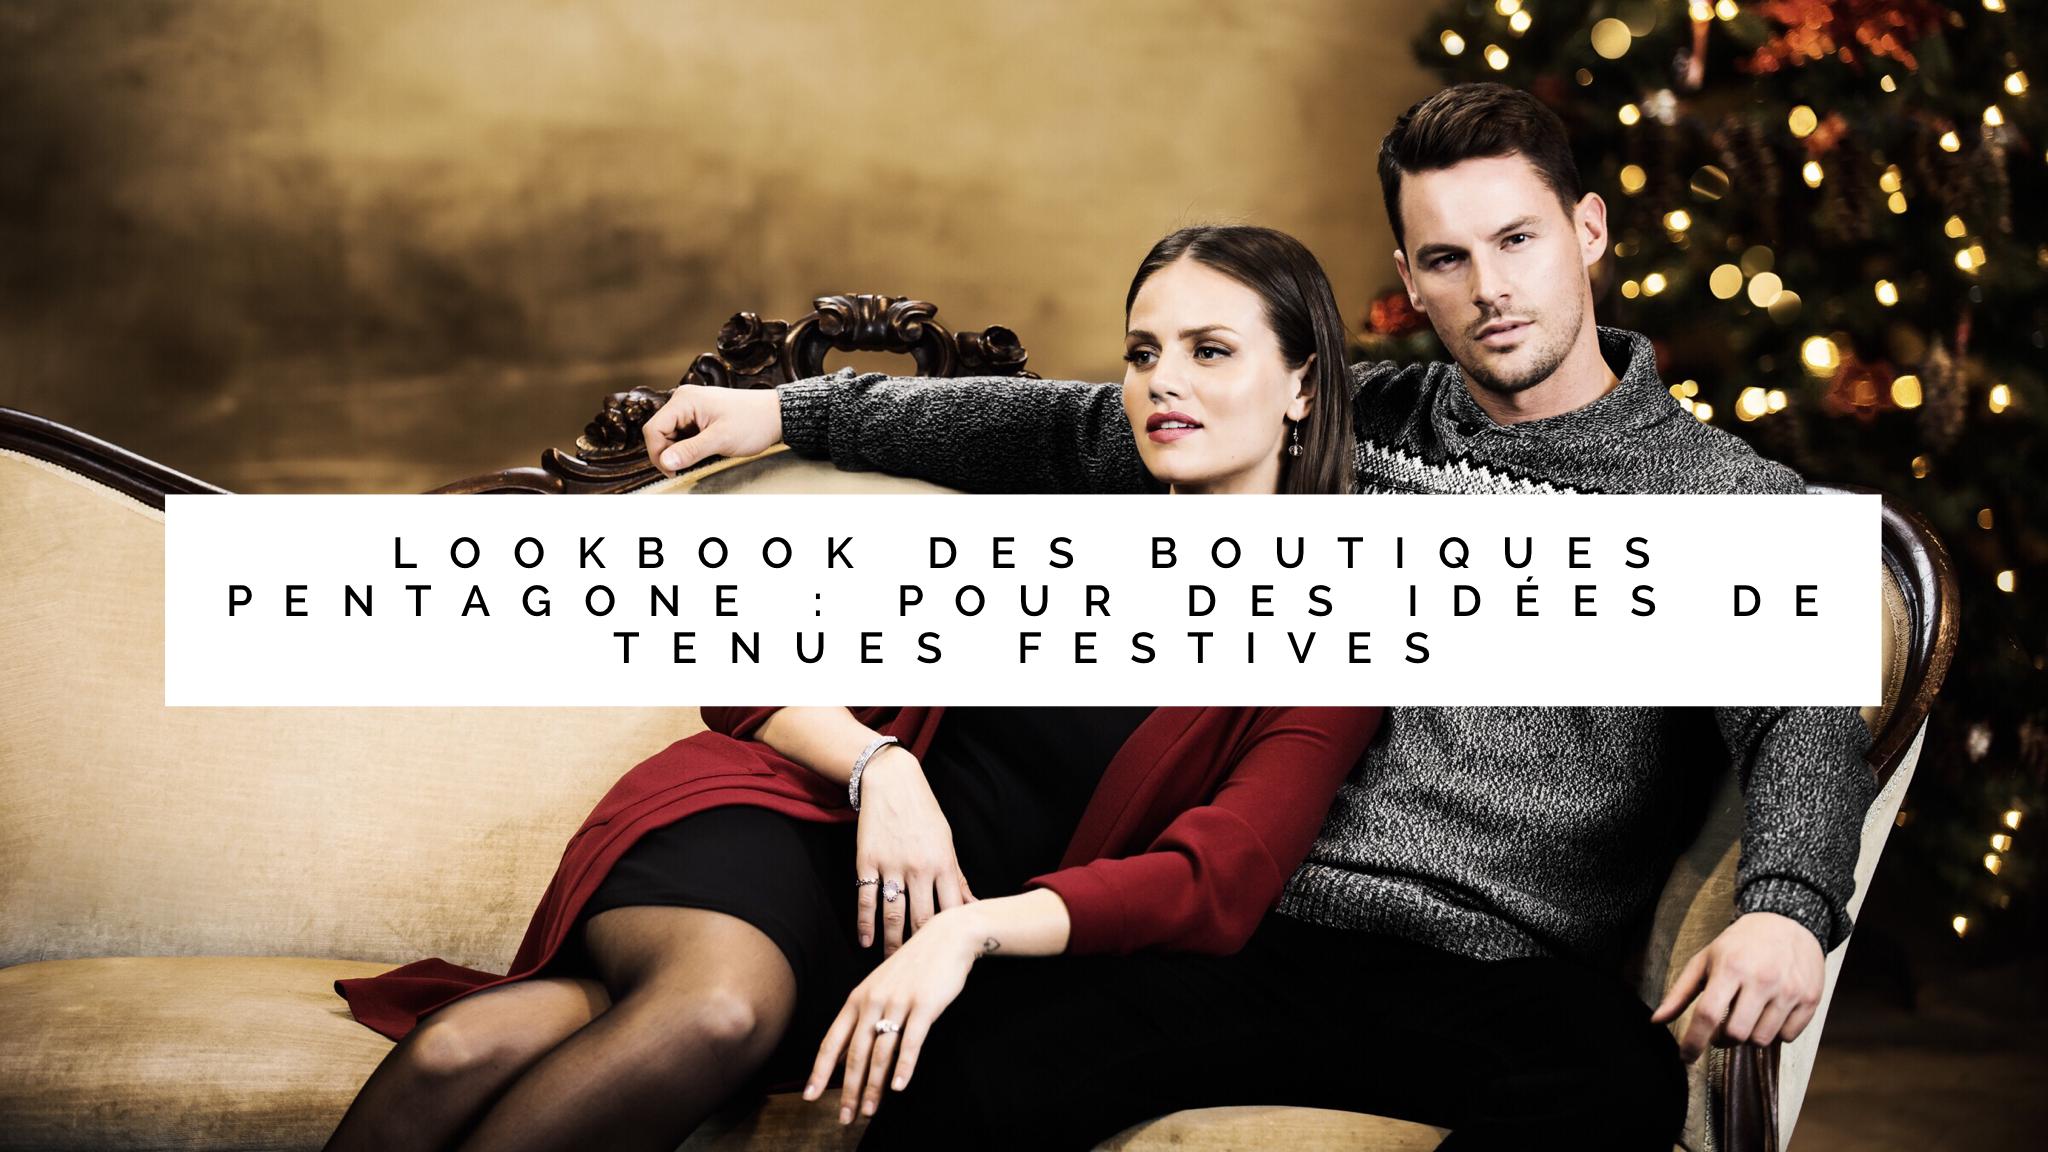 Lookbook de Noel des boutiques Pentagone